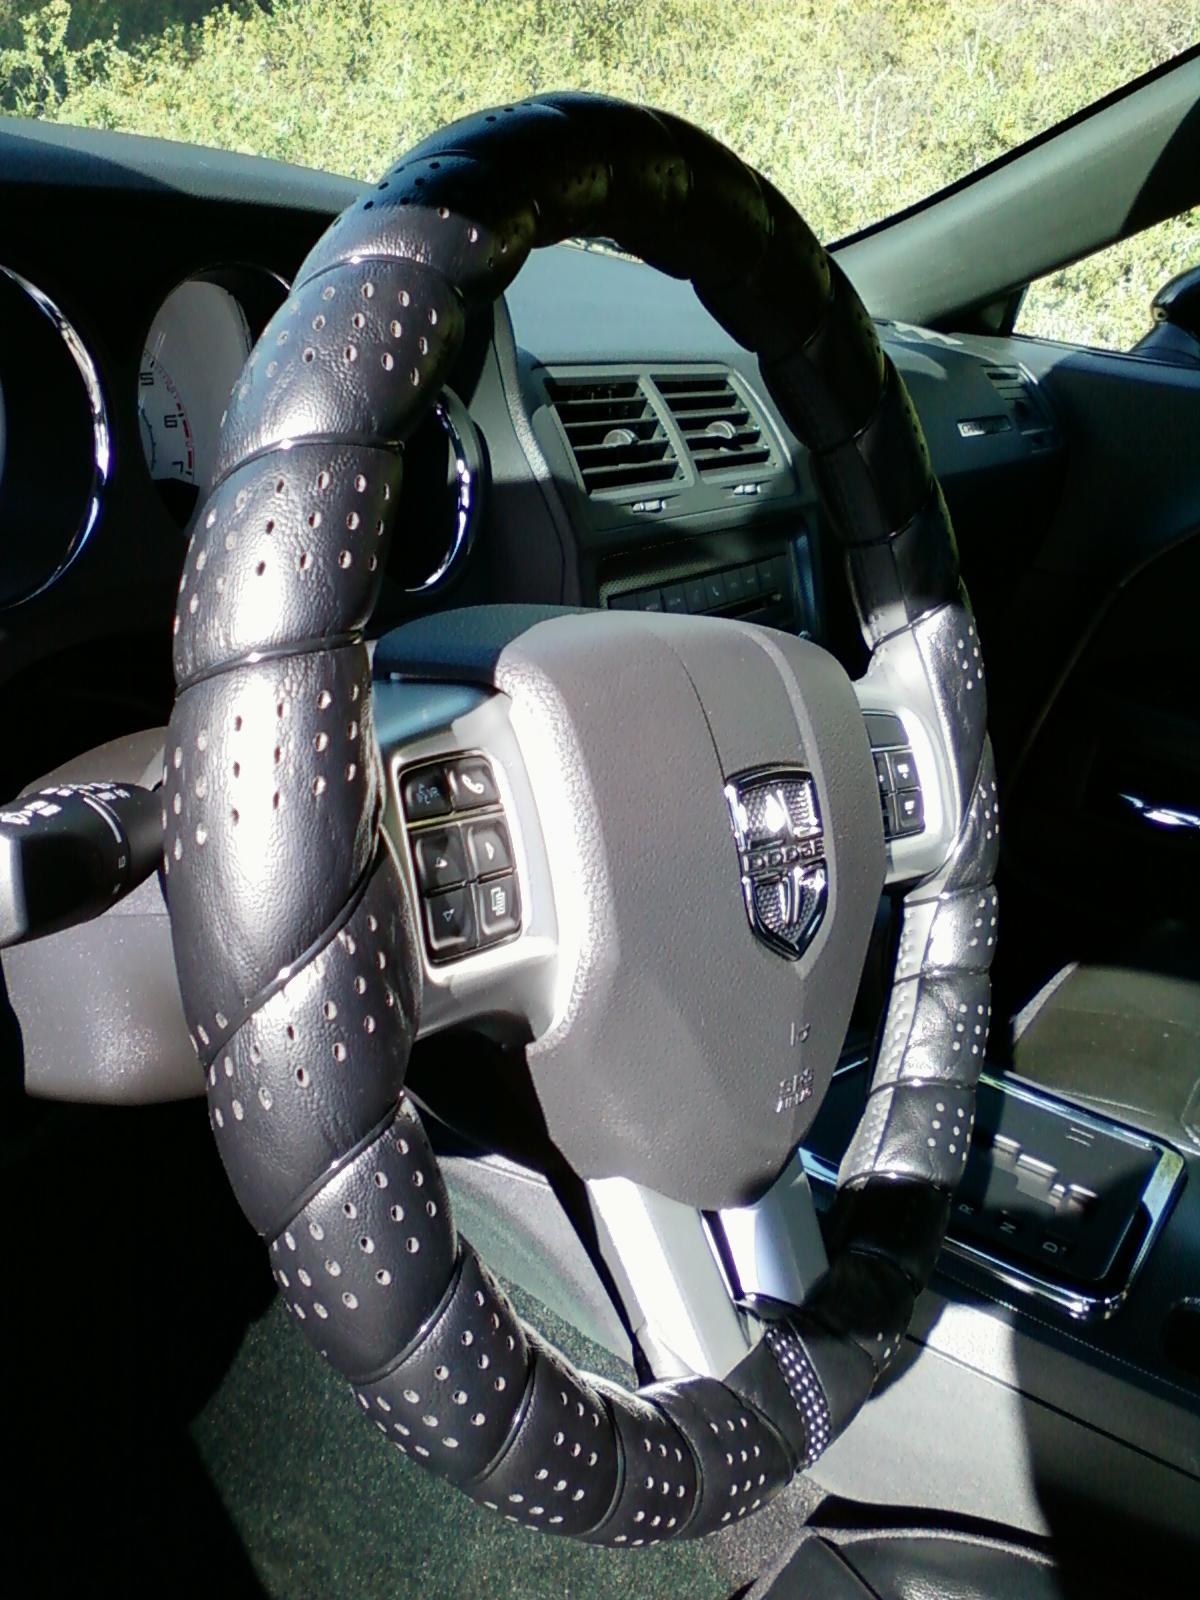 Steering wheel cover suggestions?-1205121203a.jpg